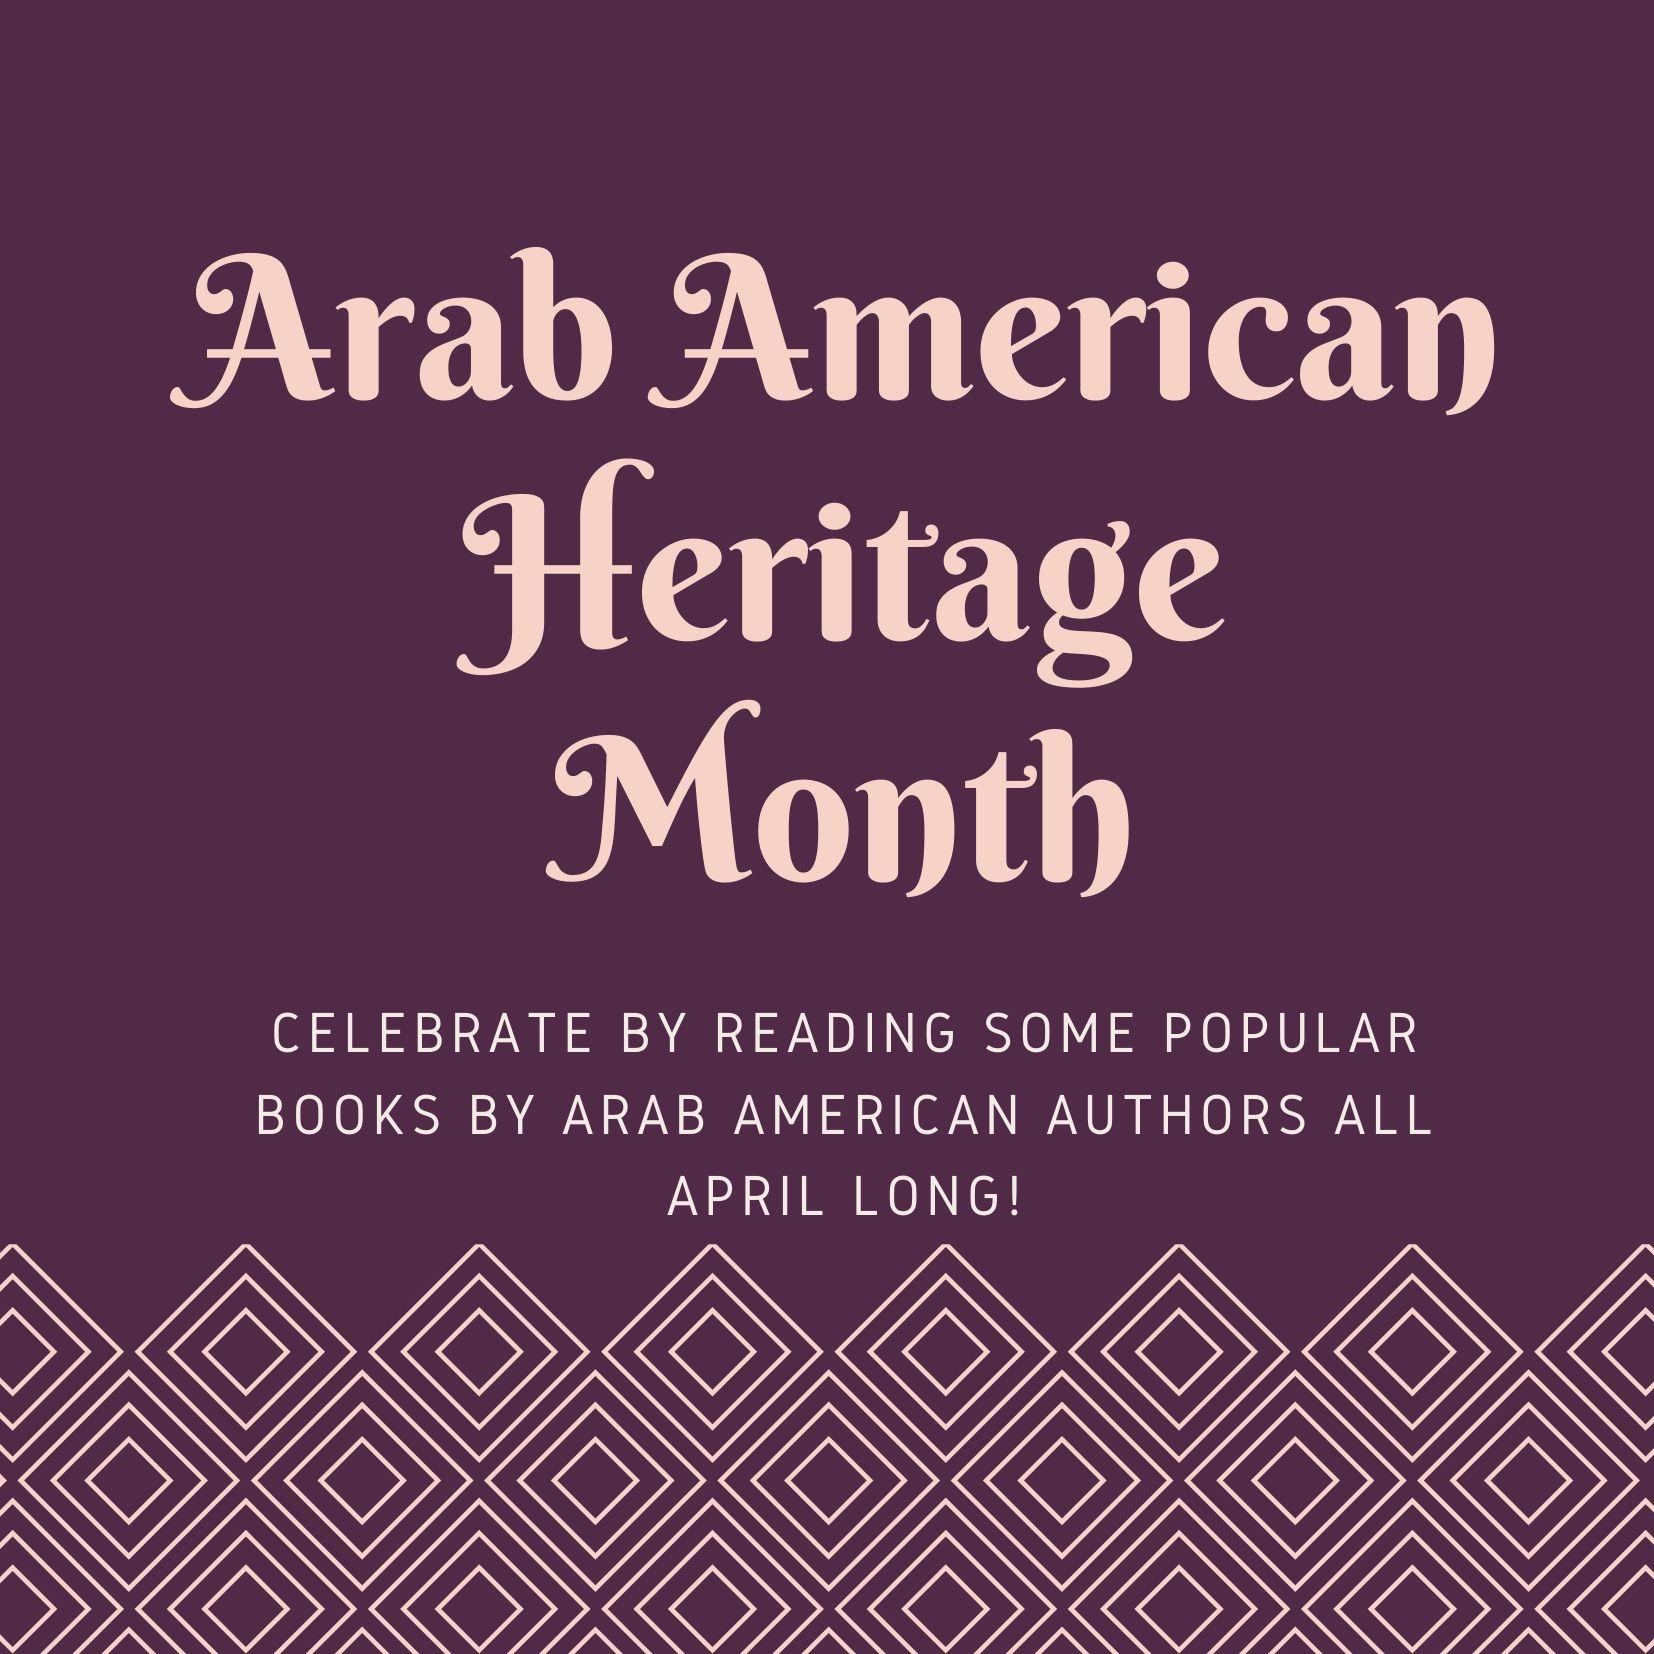 Arab American Heritage Month Image